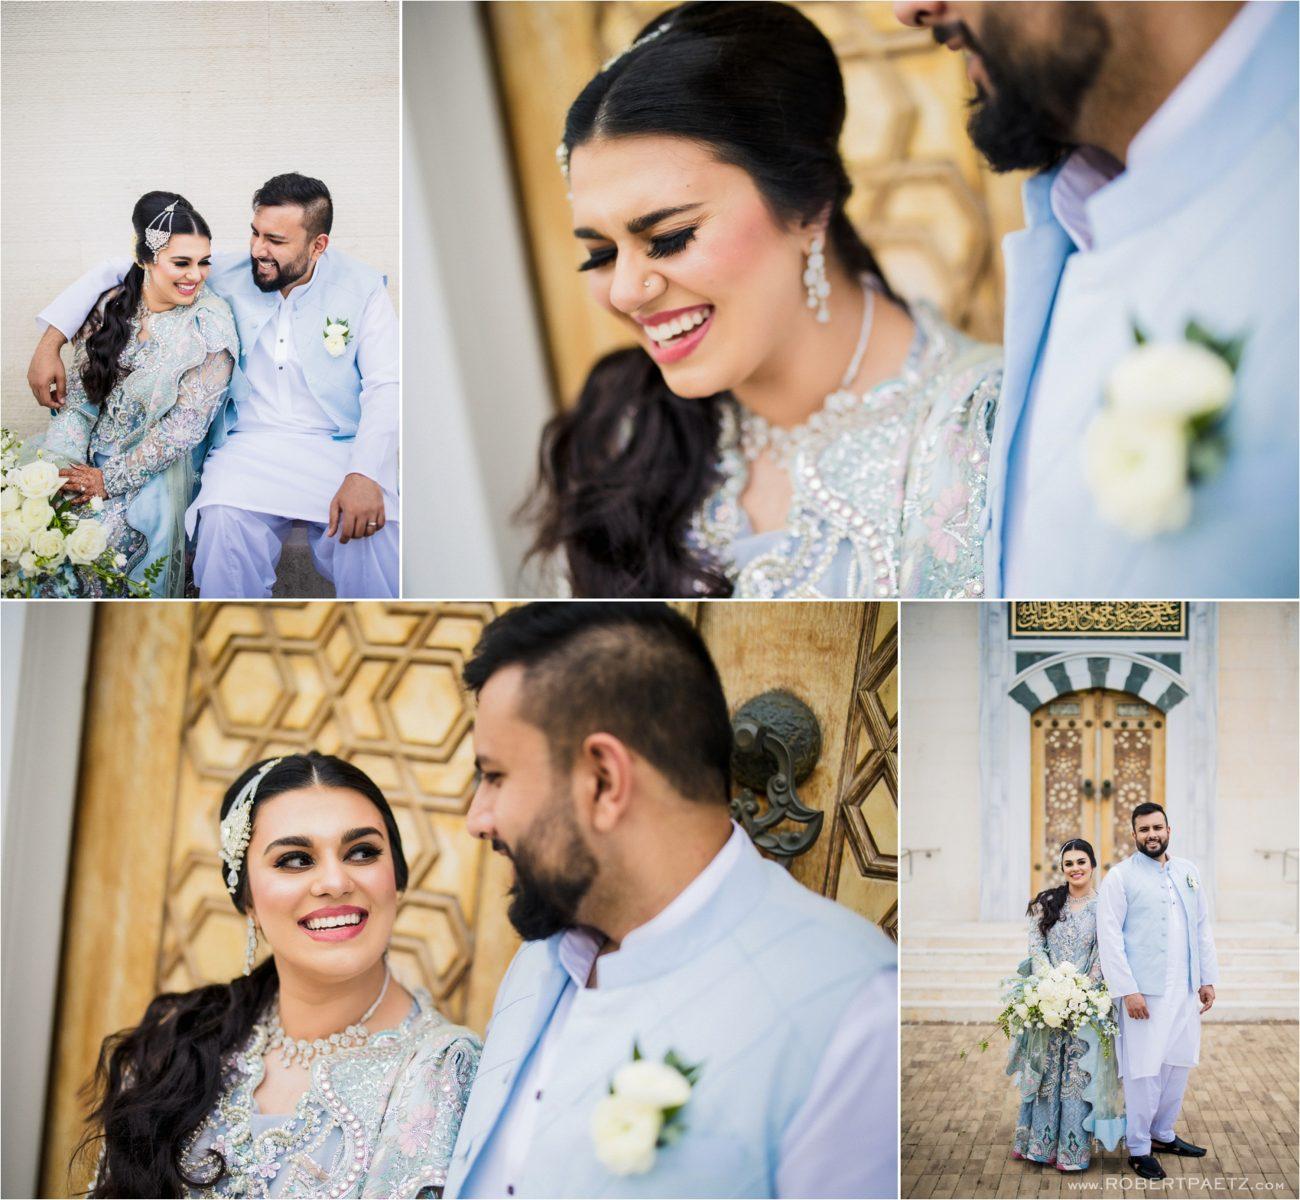 Wedding, Photography, Photographer, Diyanet, Mosque, Maryland, Baltimore, Muslim, nikkah, hyatt, regency, baltimore